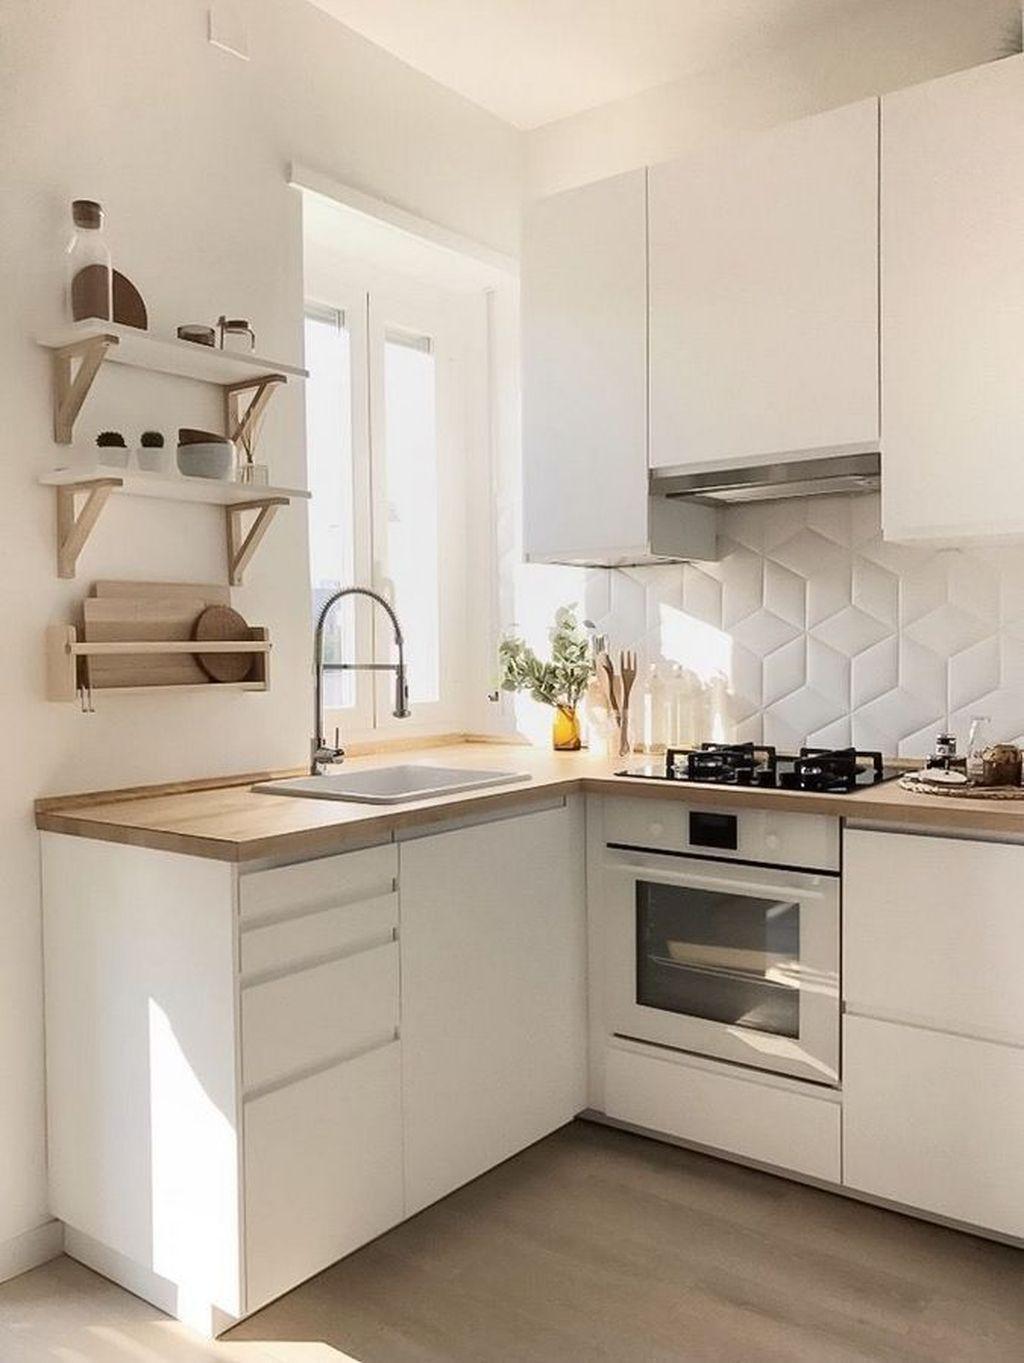 35 Amazing Small Apartment Kitchen Ideas Kitchen Small